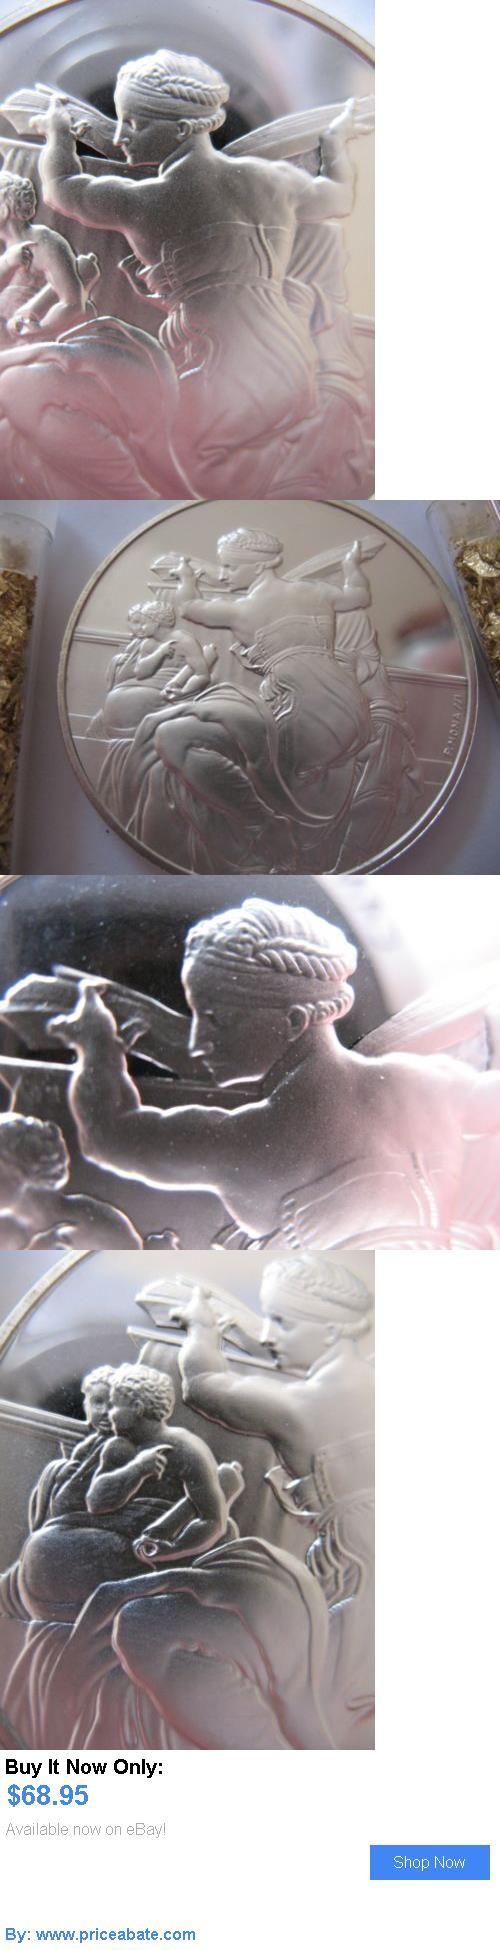 Bullion: 1.3-Oz 925 Silver Coin Sistine Chapel Genius Of Michelangelo Libyan Sybil  Gold BUY IT NOW ONLY: $68.95 #priceabateBullion OR #priceabate